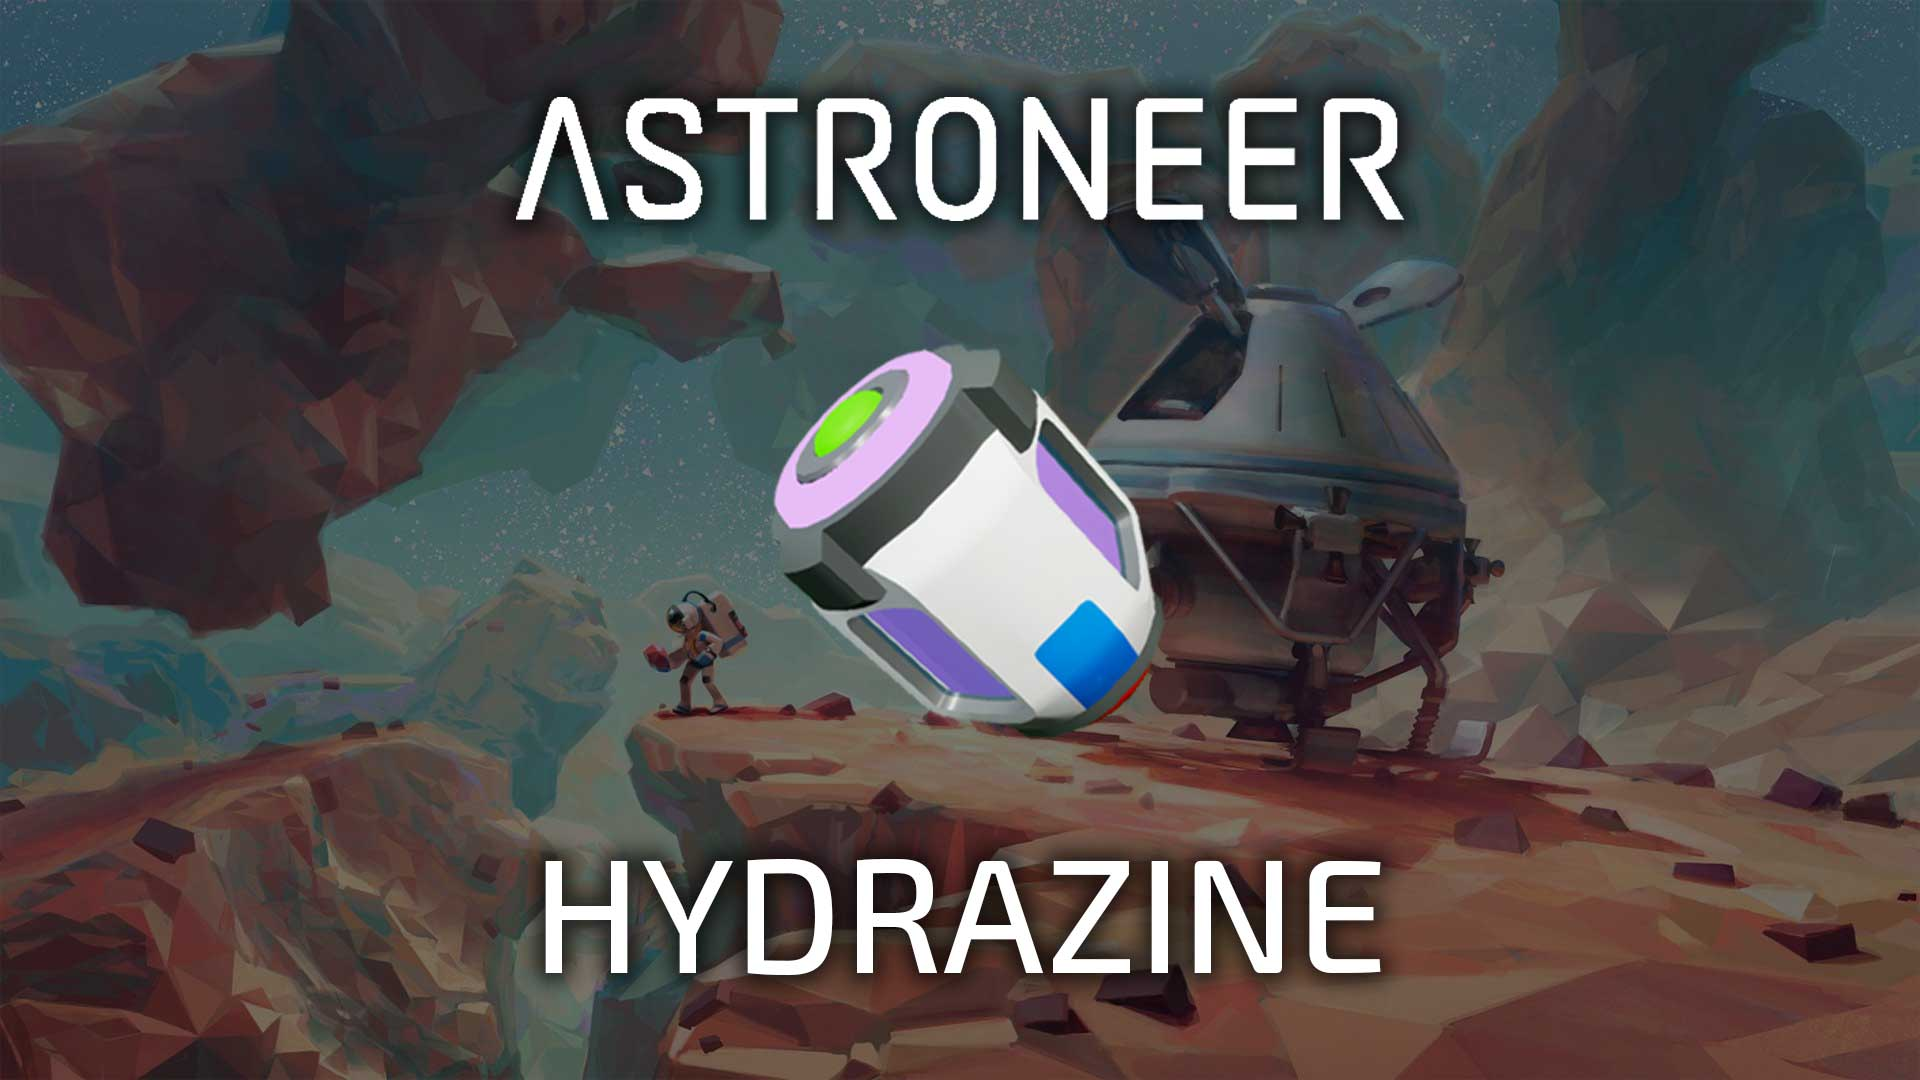 astroneer hydrazine